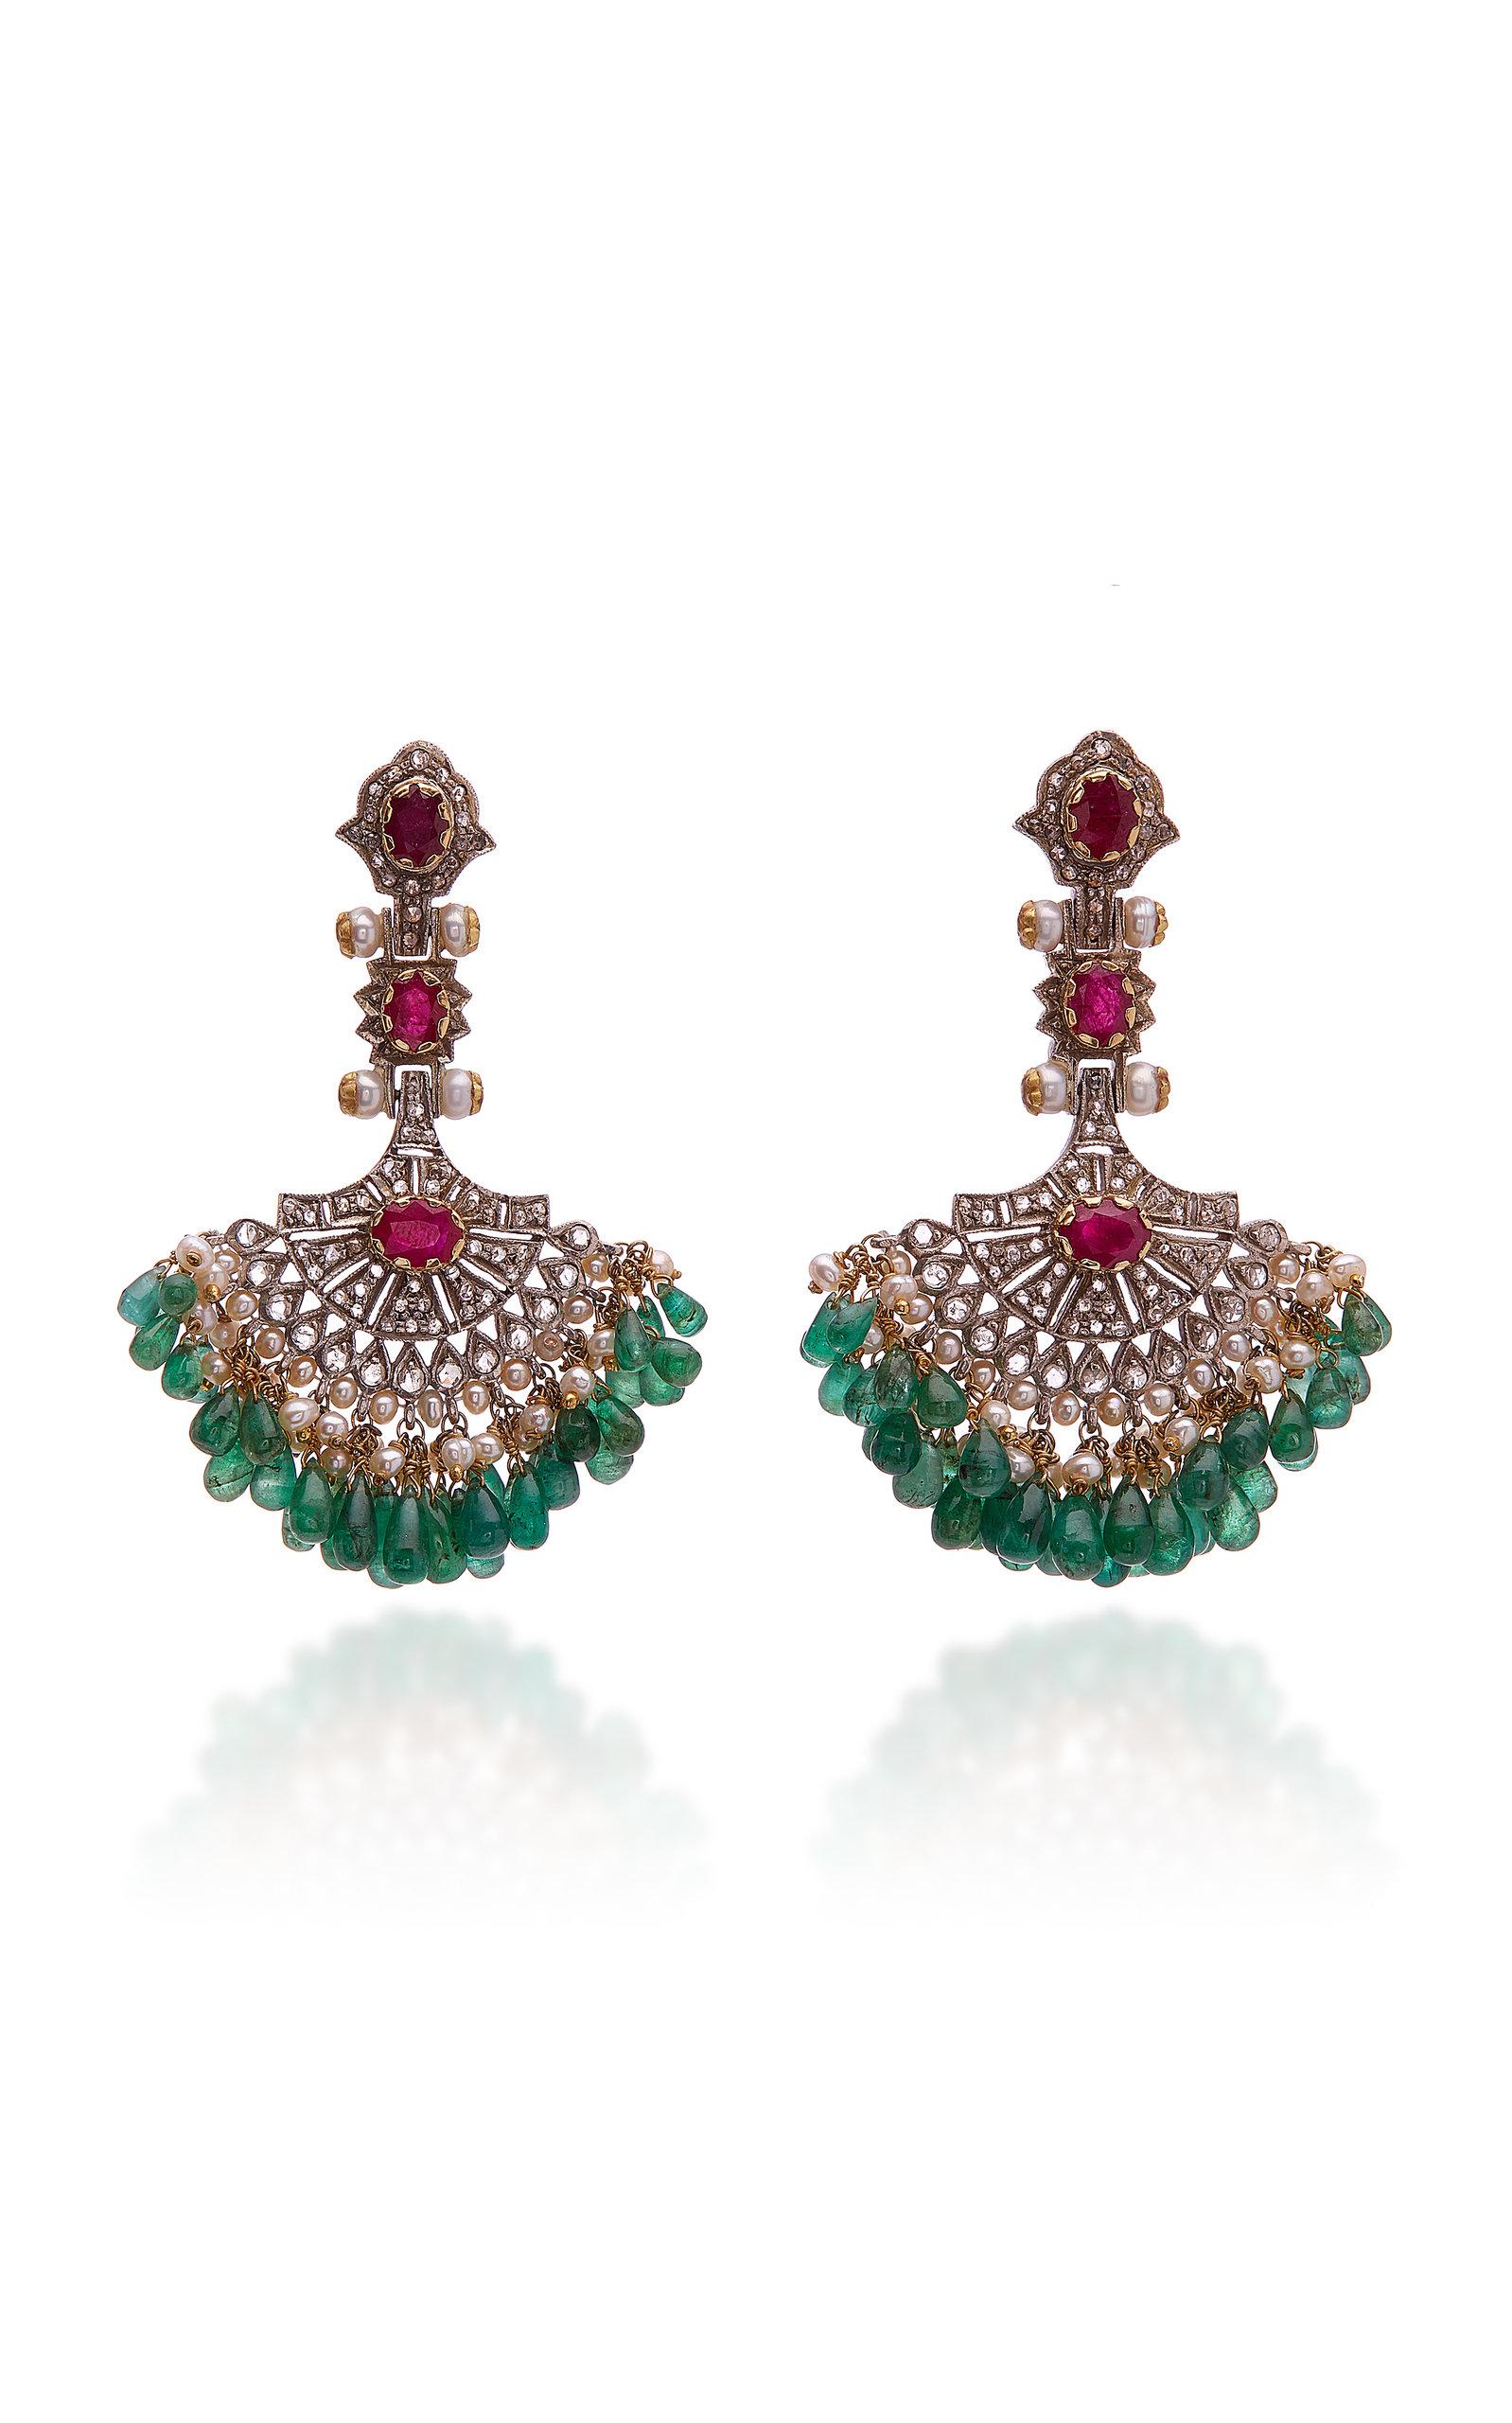 SANJAY KASLIWAL 18K Gold Silver And Multi-Stone Earrings